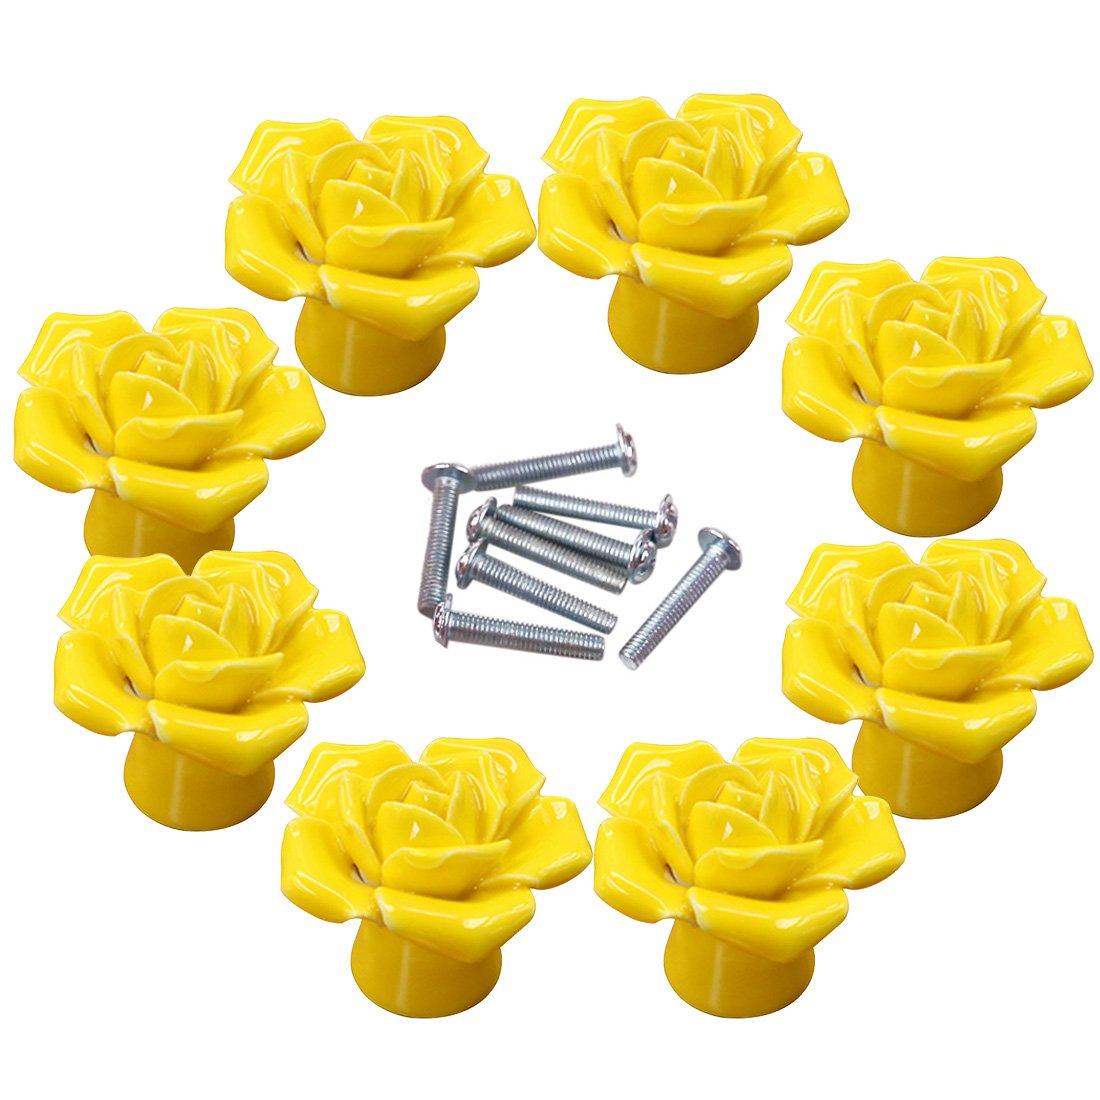 8St LoKauf M/öbelknopf Rosen M/öbelknopf Keramik Schrankkn/öpfe M/öbelkn/öpfe Set M/öbelgriffe Schrankgriffe